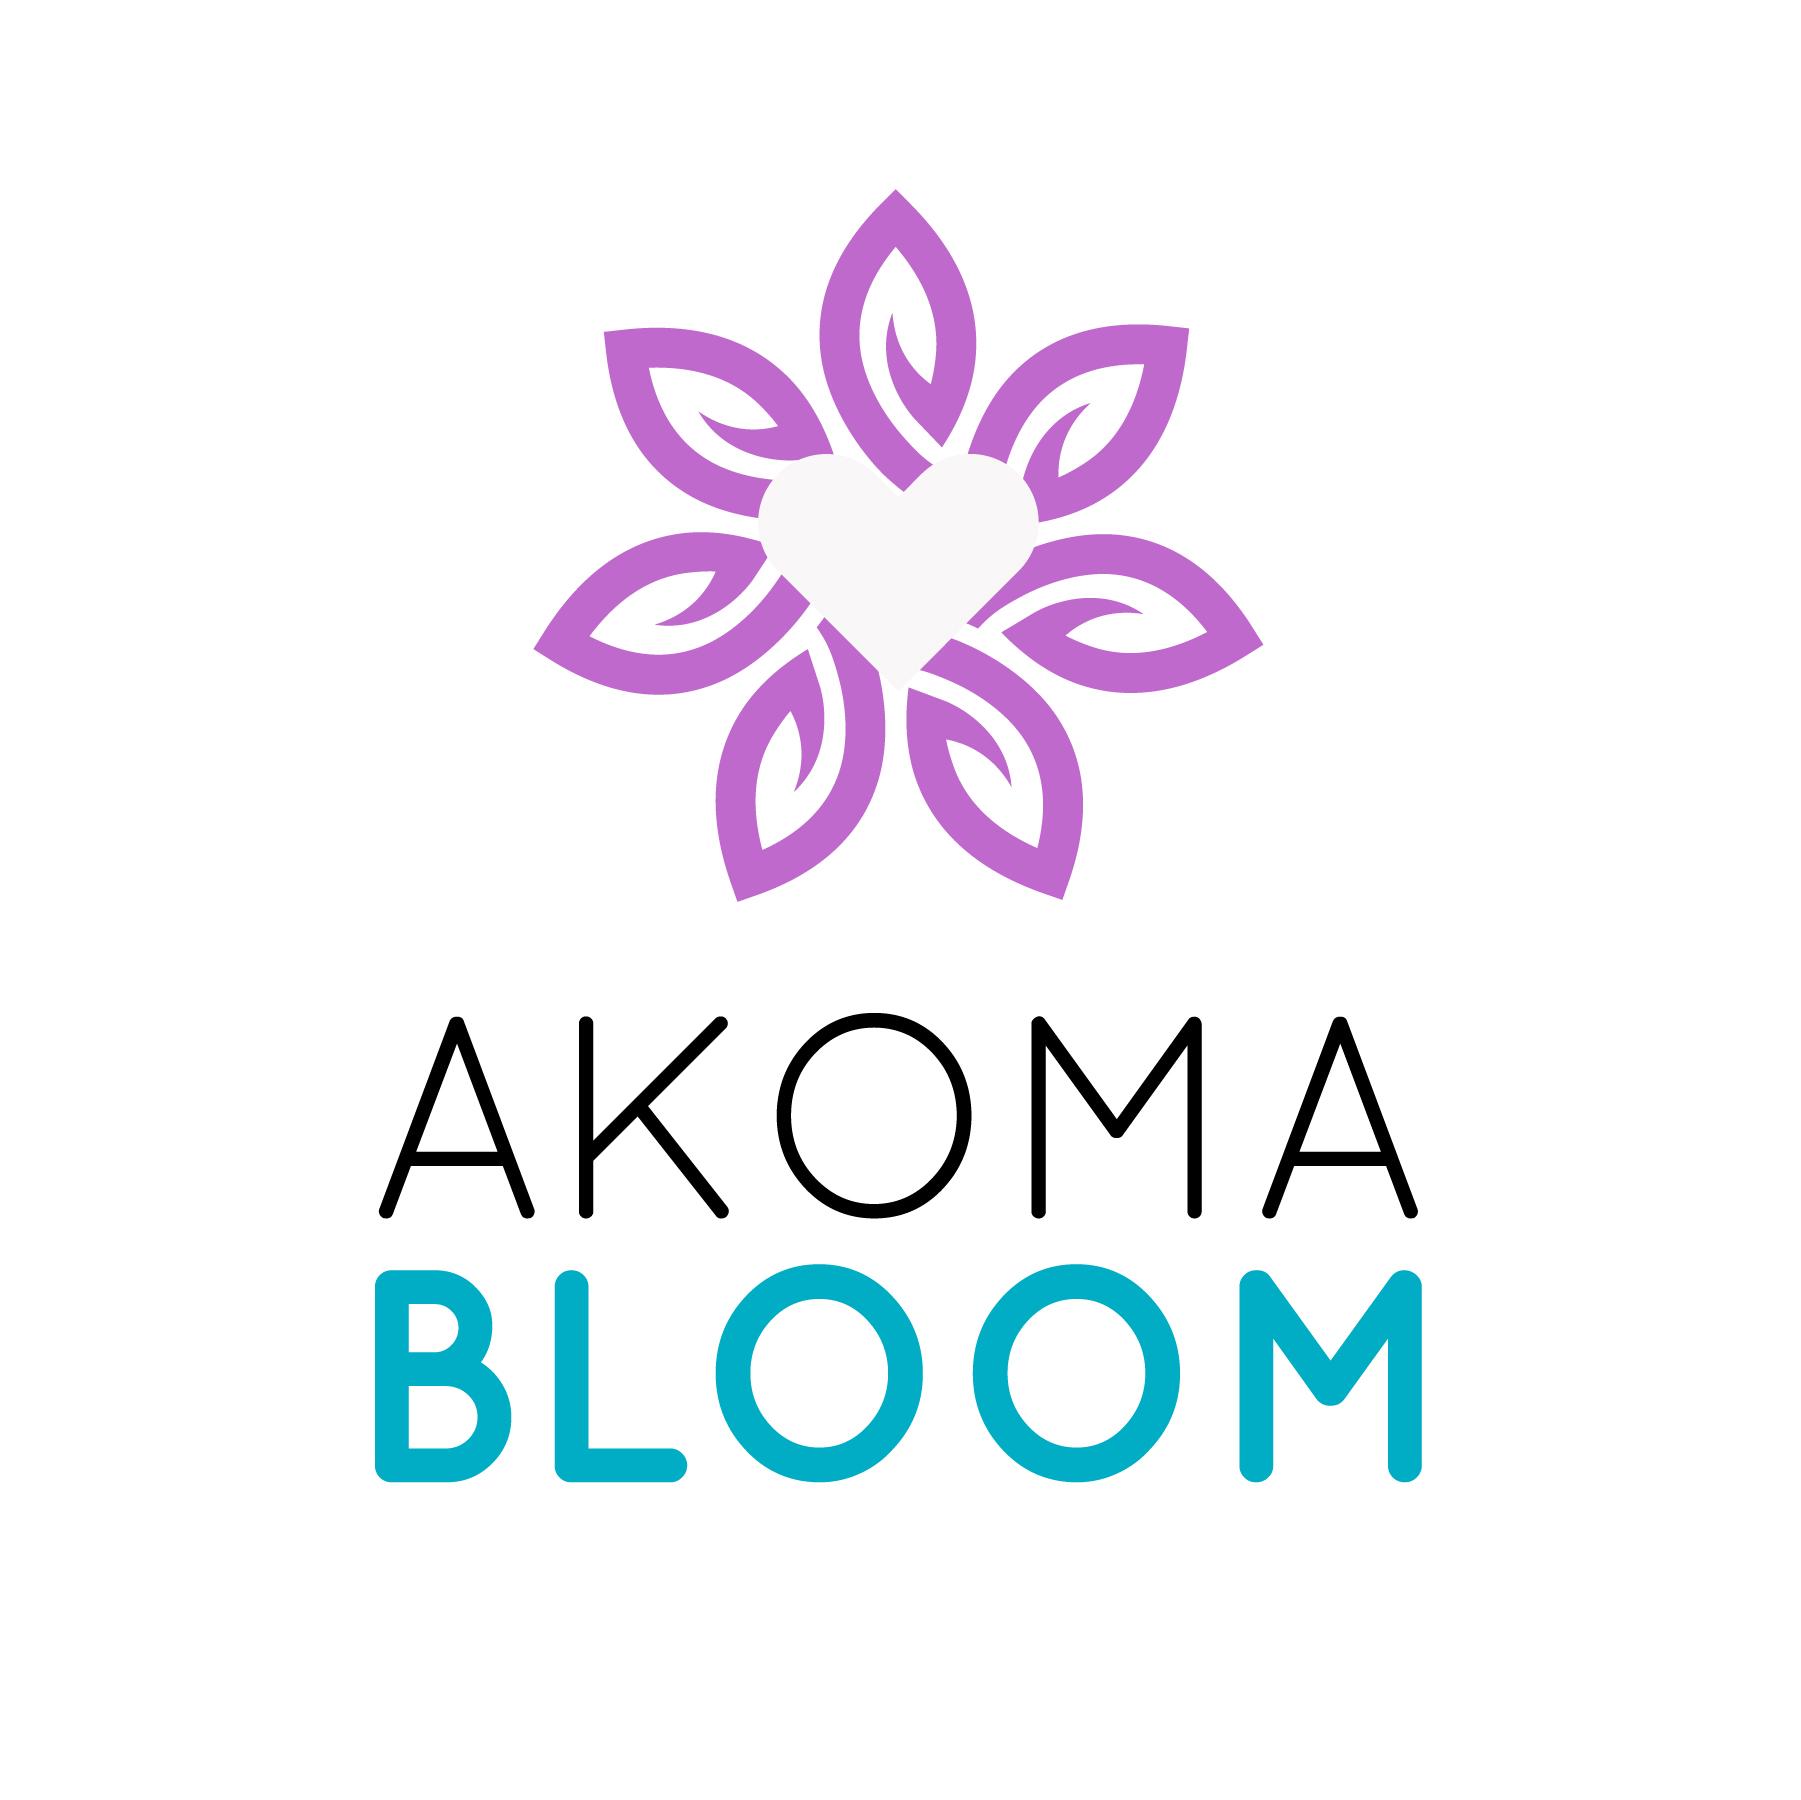 Akoma_Bloom-04.jpg